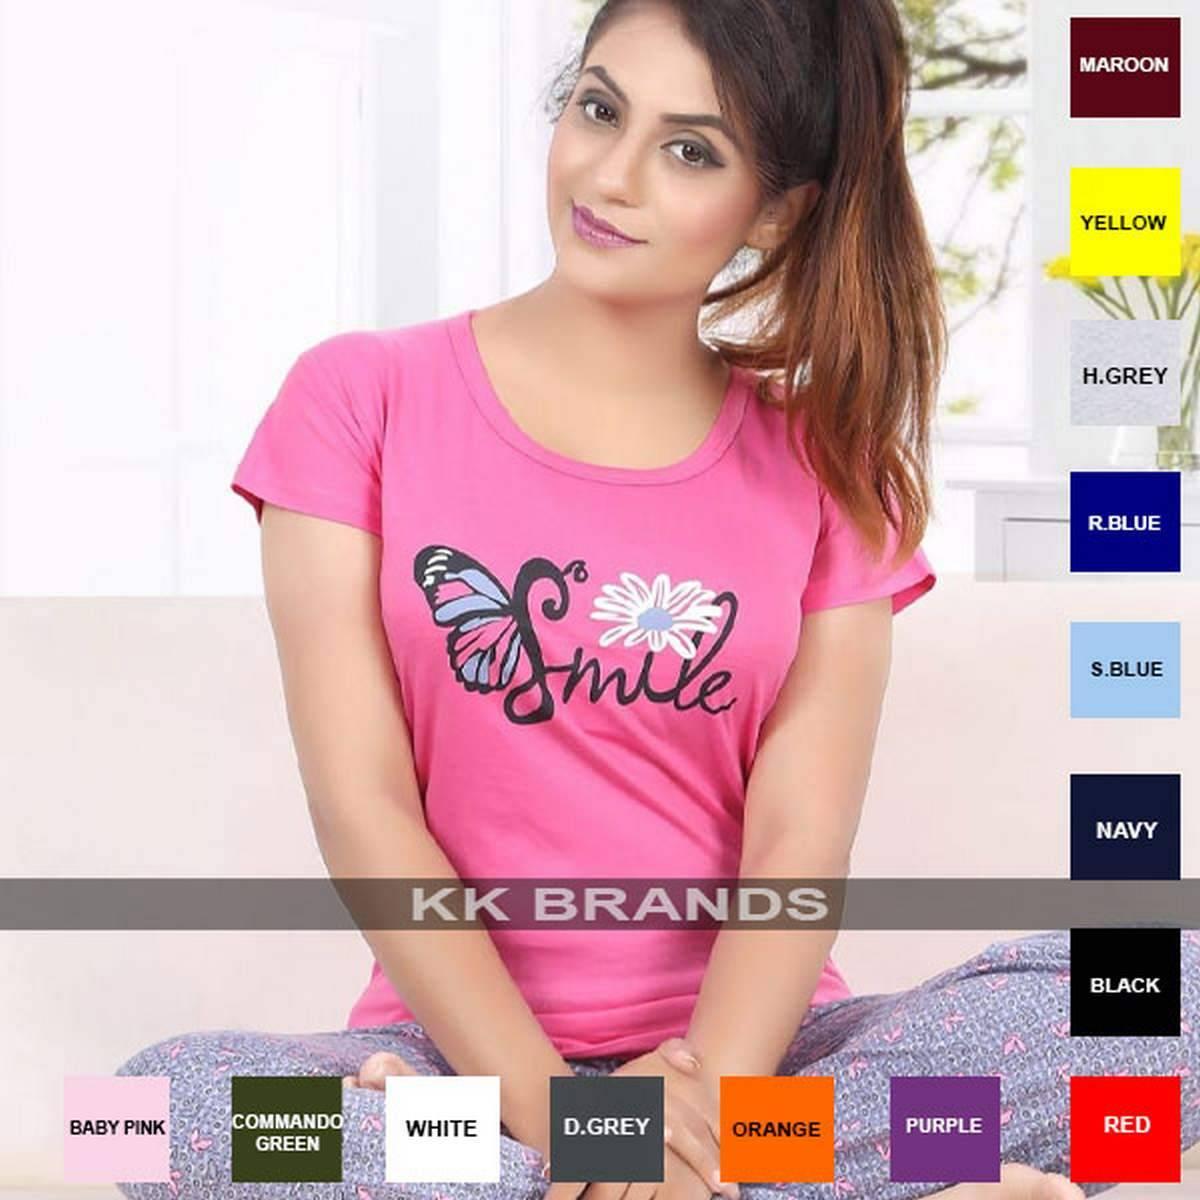 KK BRANDS Women Tshirt Girls Cute Smile Love Shape Top